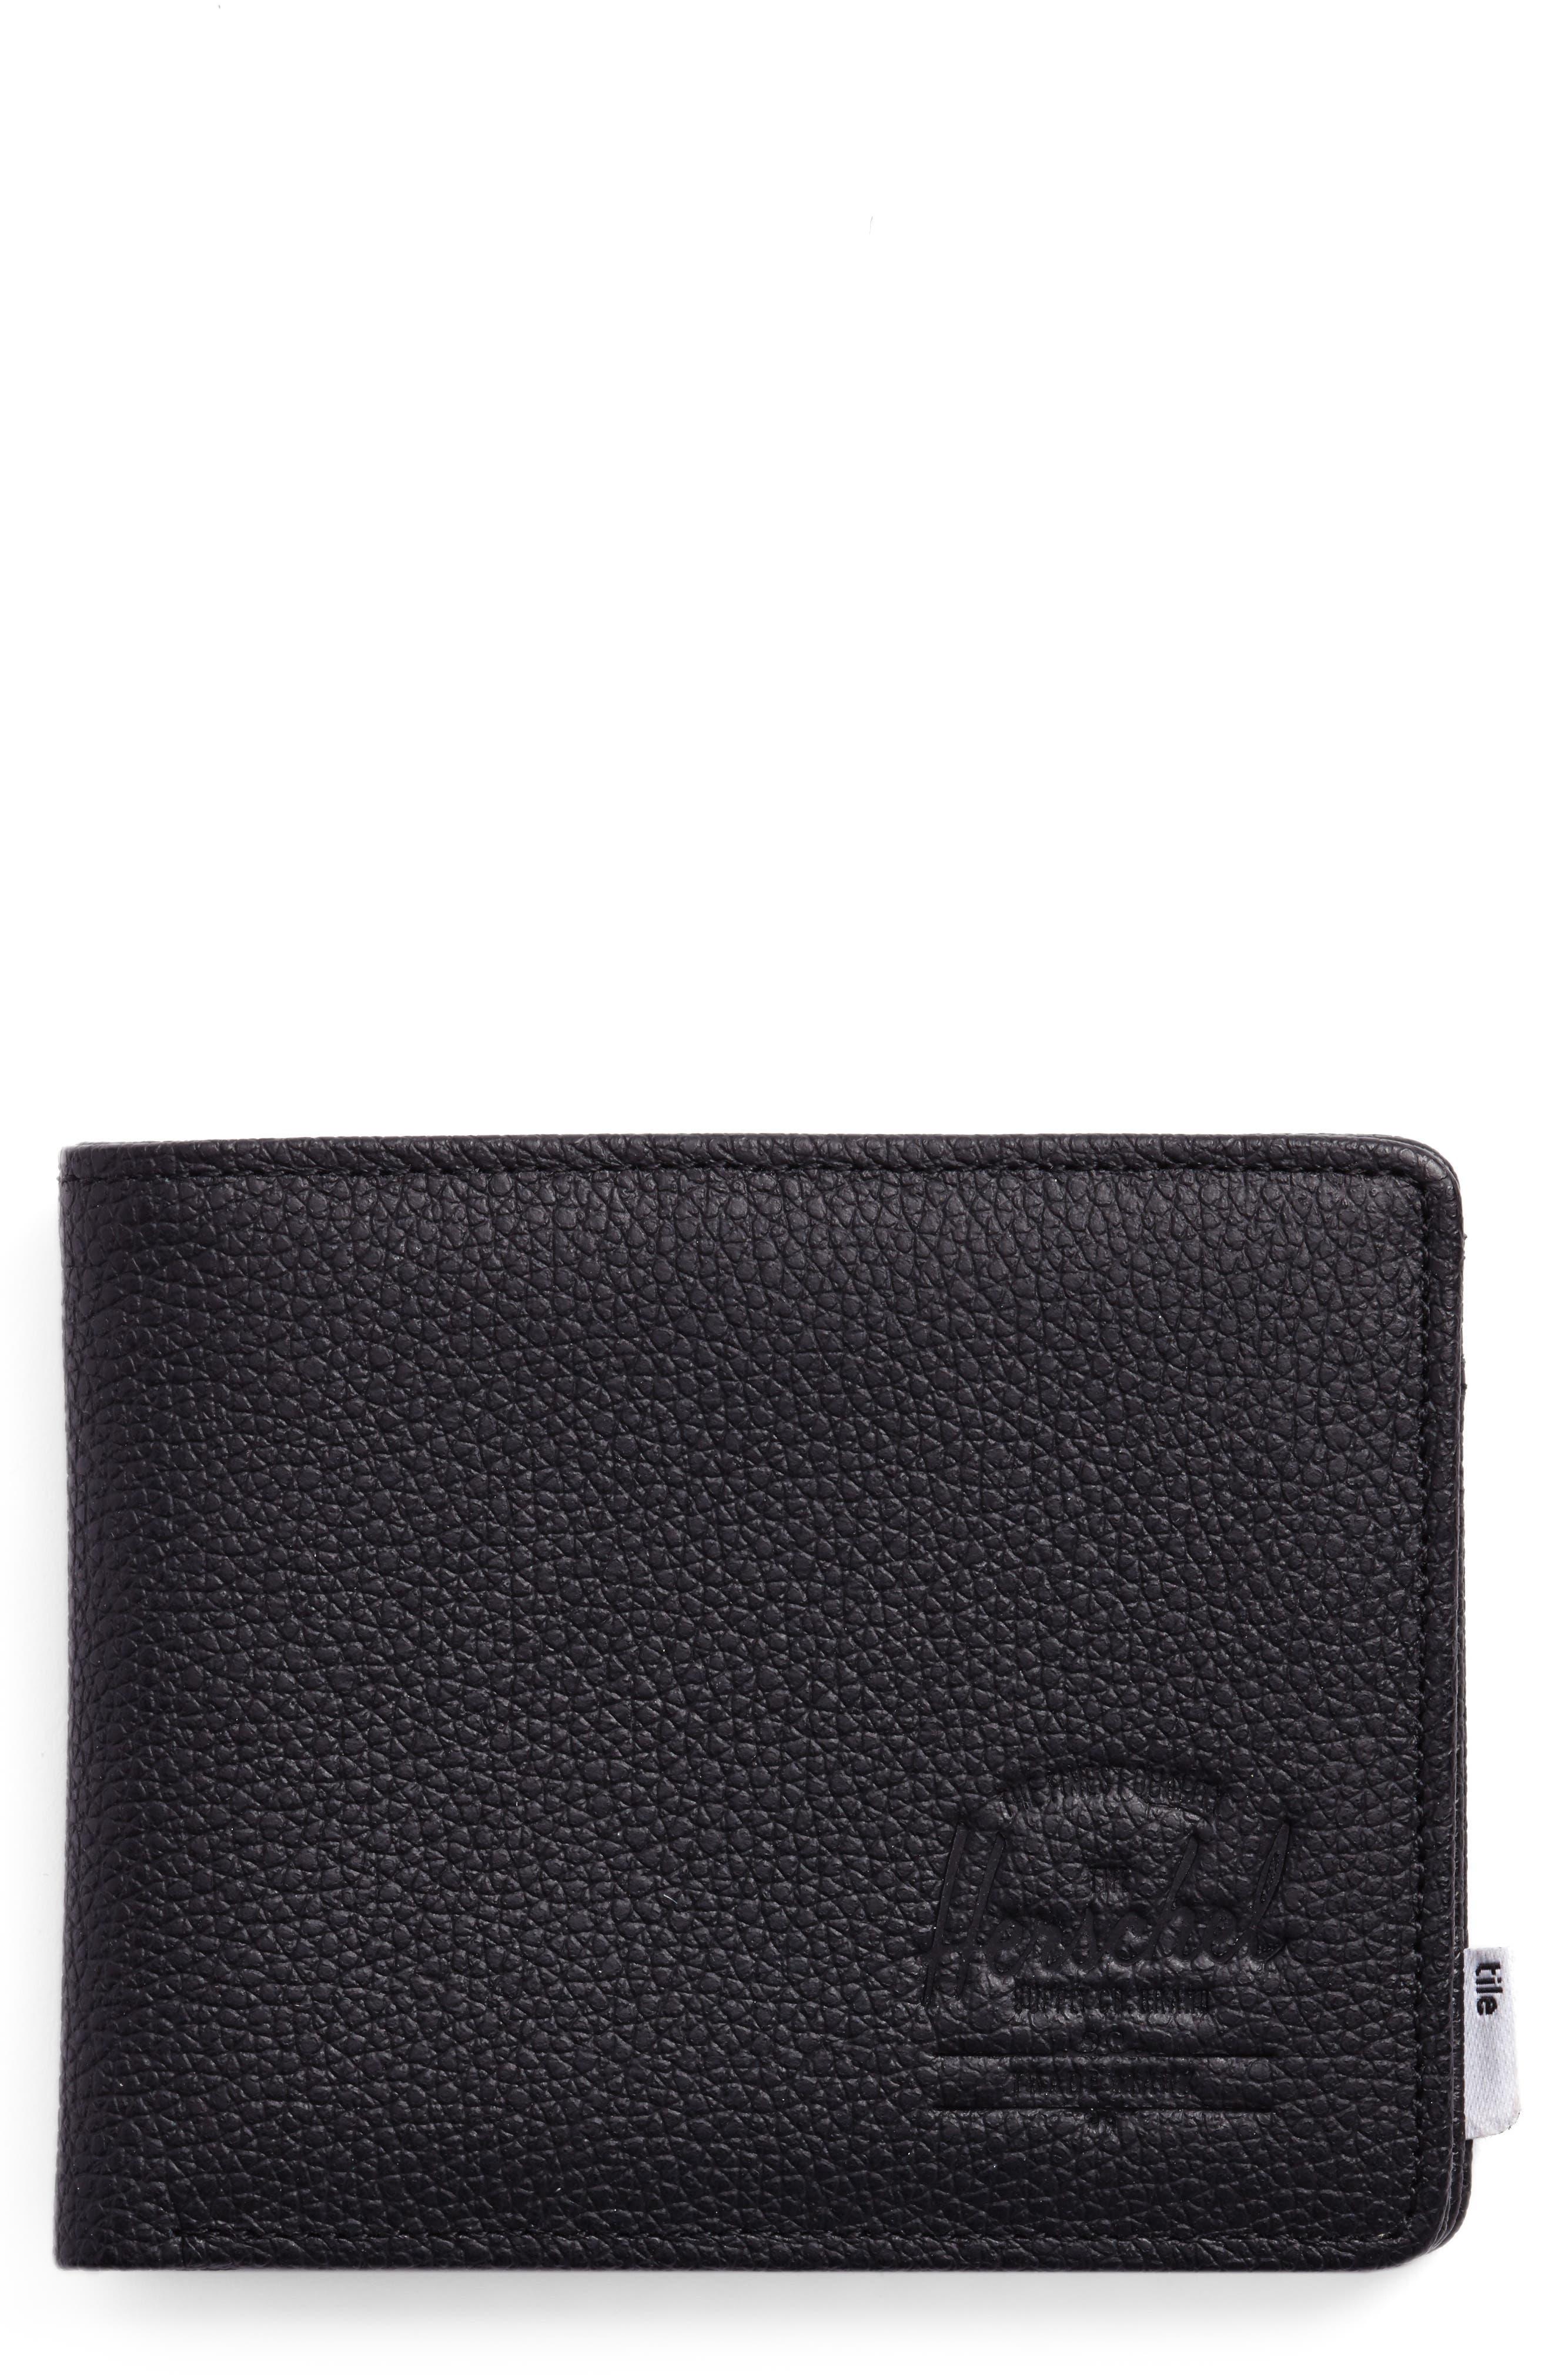 Tile Roy Leather Wallet,                         Main,                         color, Black Pebbled Leather